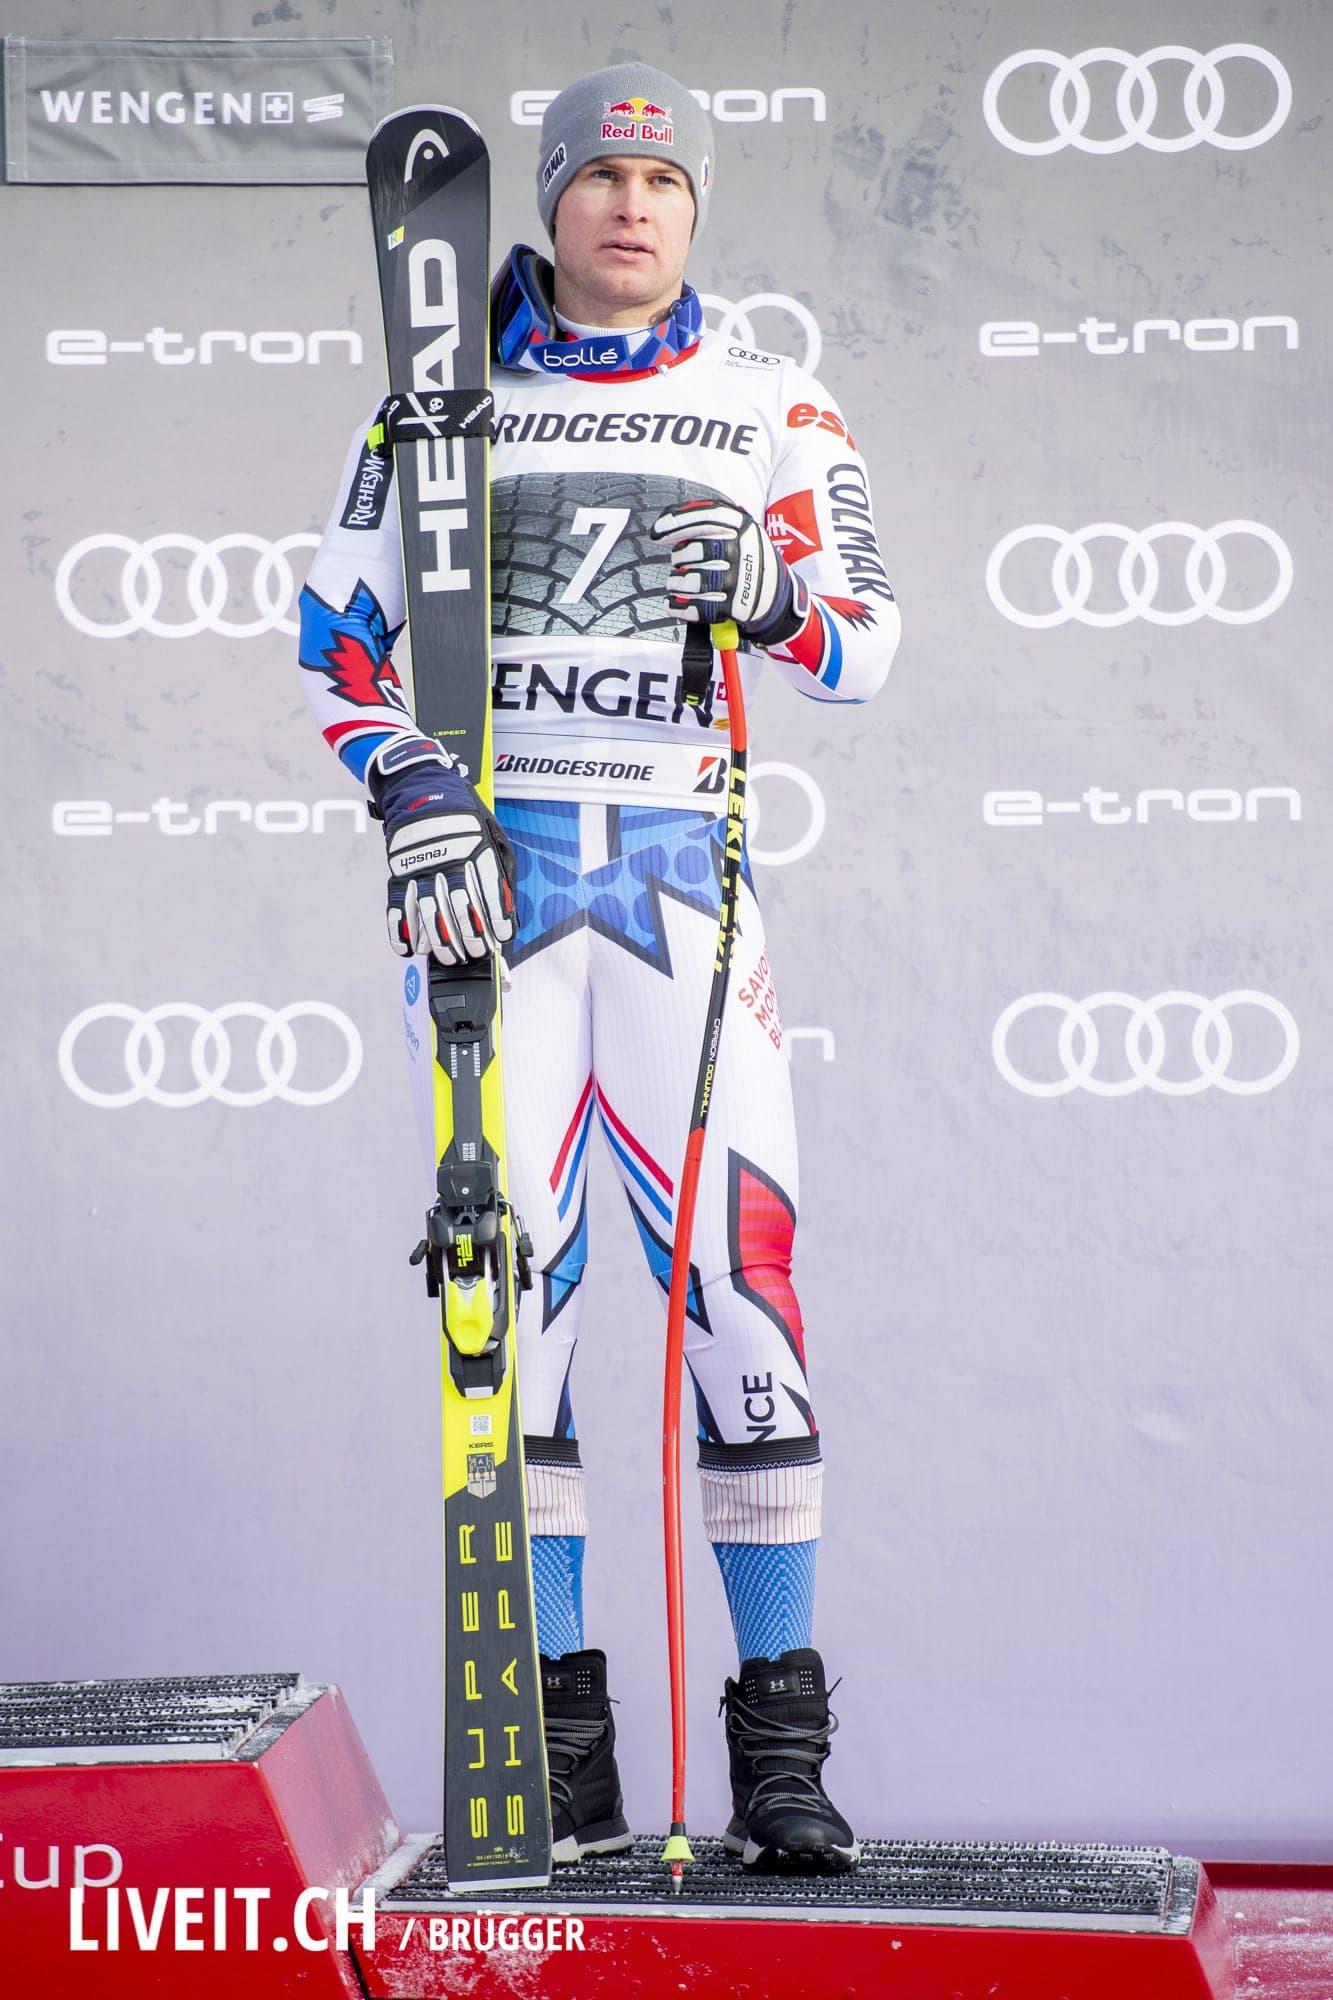 Alexis Pinturault (FRA) fotografiert am Freitag, 18. Januar 2019 am Lauberhornrennen in der Disziplin: Slalom Alpine Kombination. (Fotografiert von Dominic Bruegger liveit.ch)